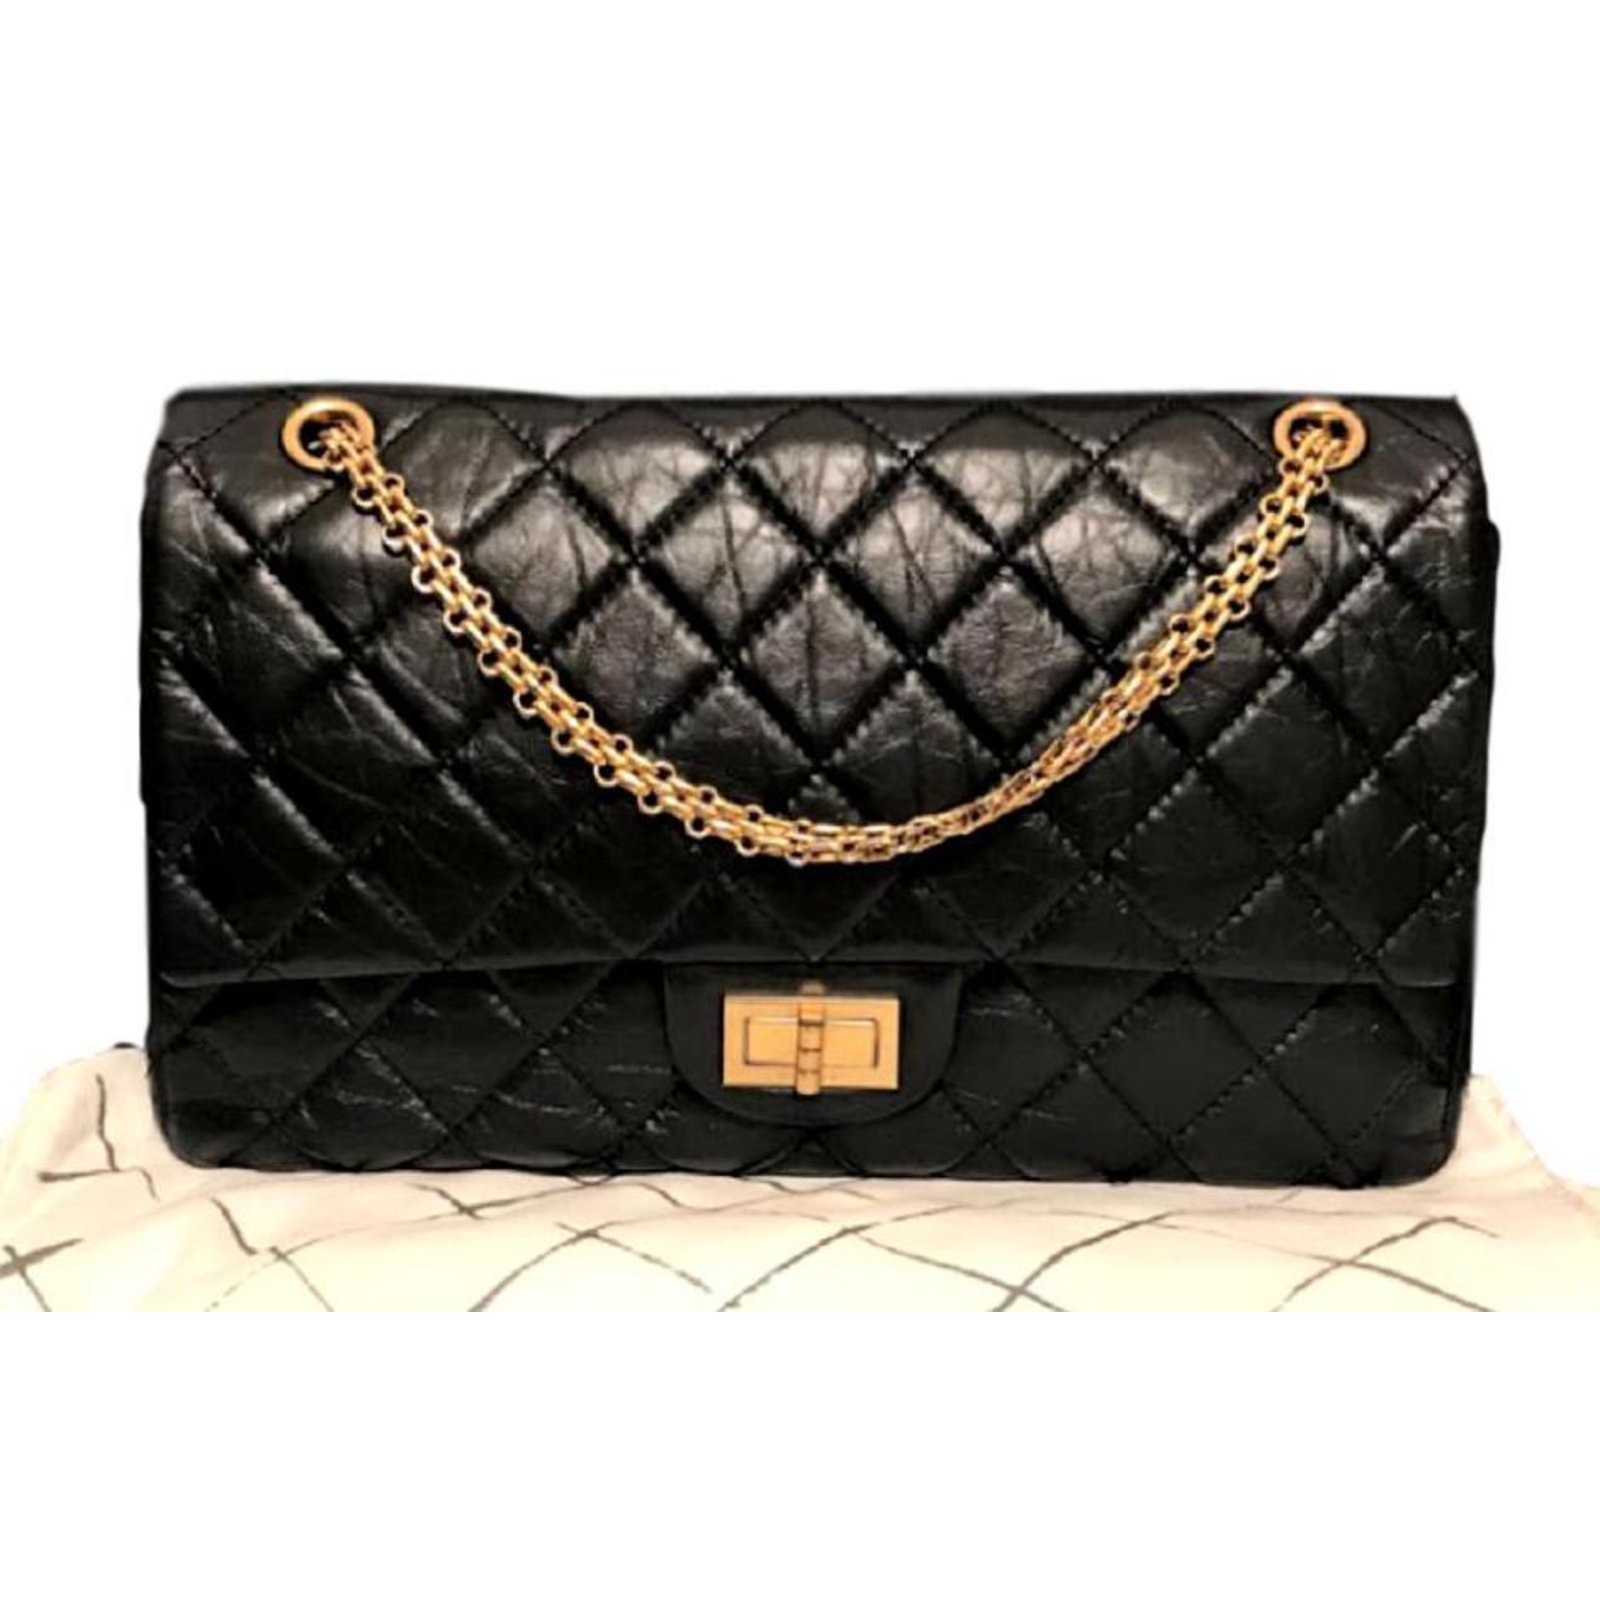 4773ba23df93 Chanel 2.55 Reissue 227 Handbags Leather Black ref.93258 - Joli Closet